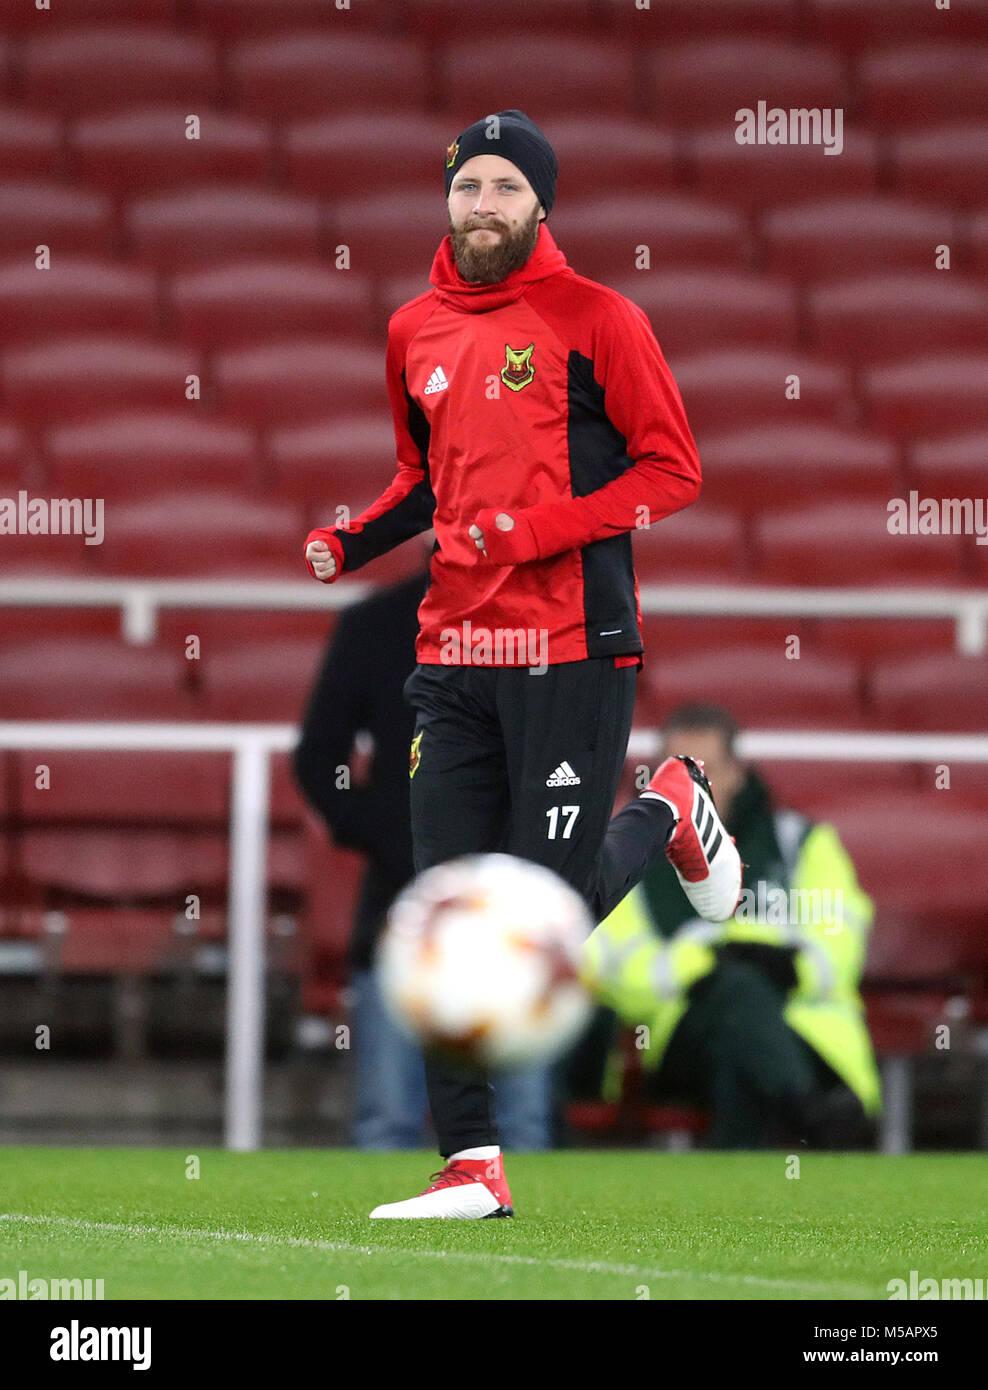 Ostersunds FK's Curtis Edwards während des Trainings im Emirates Stadium, London. Stockfoto